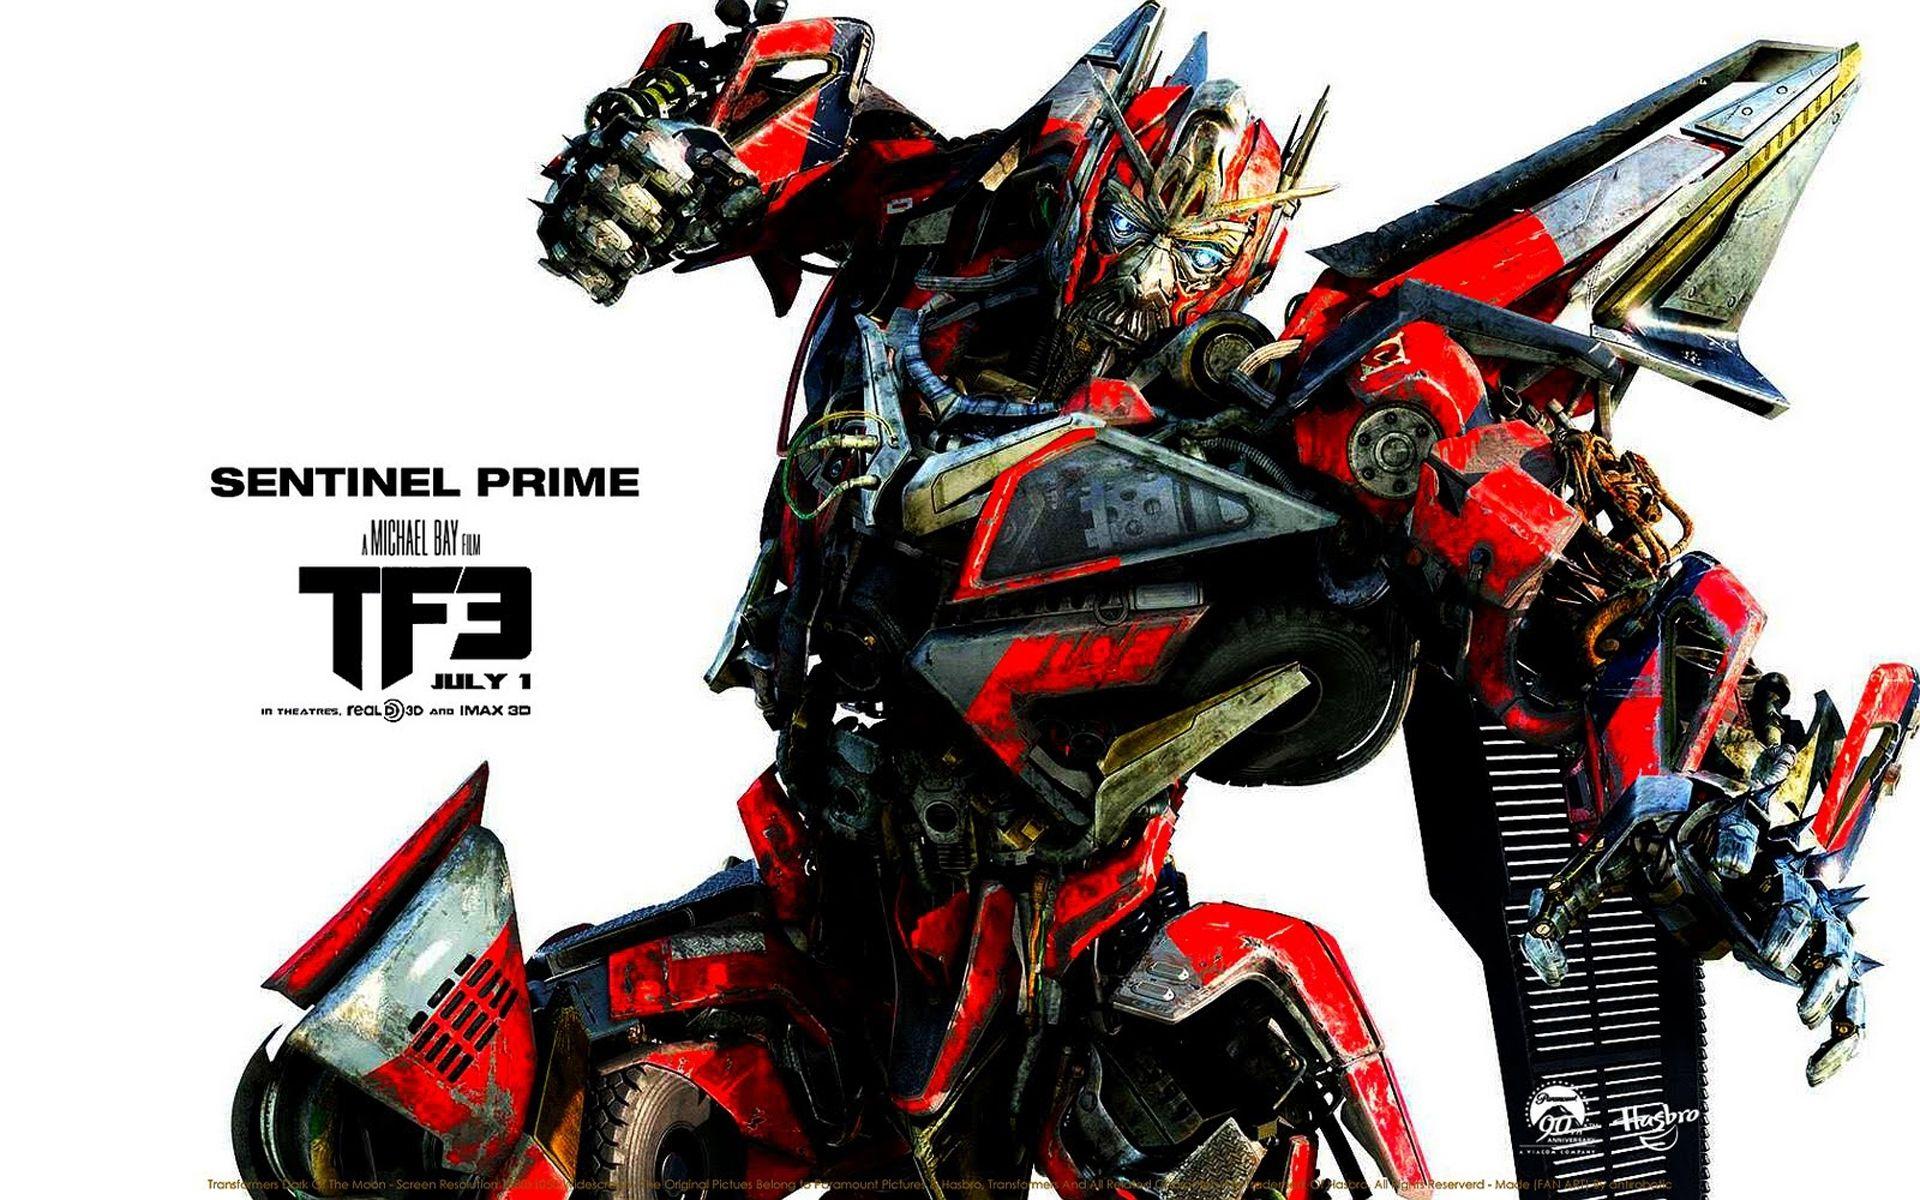 transformers optimus prime wallpapers mobile pics | wallpapers